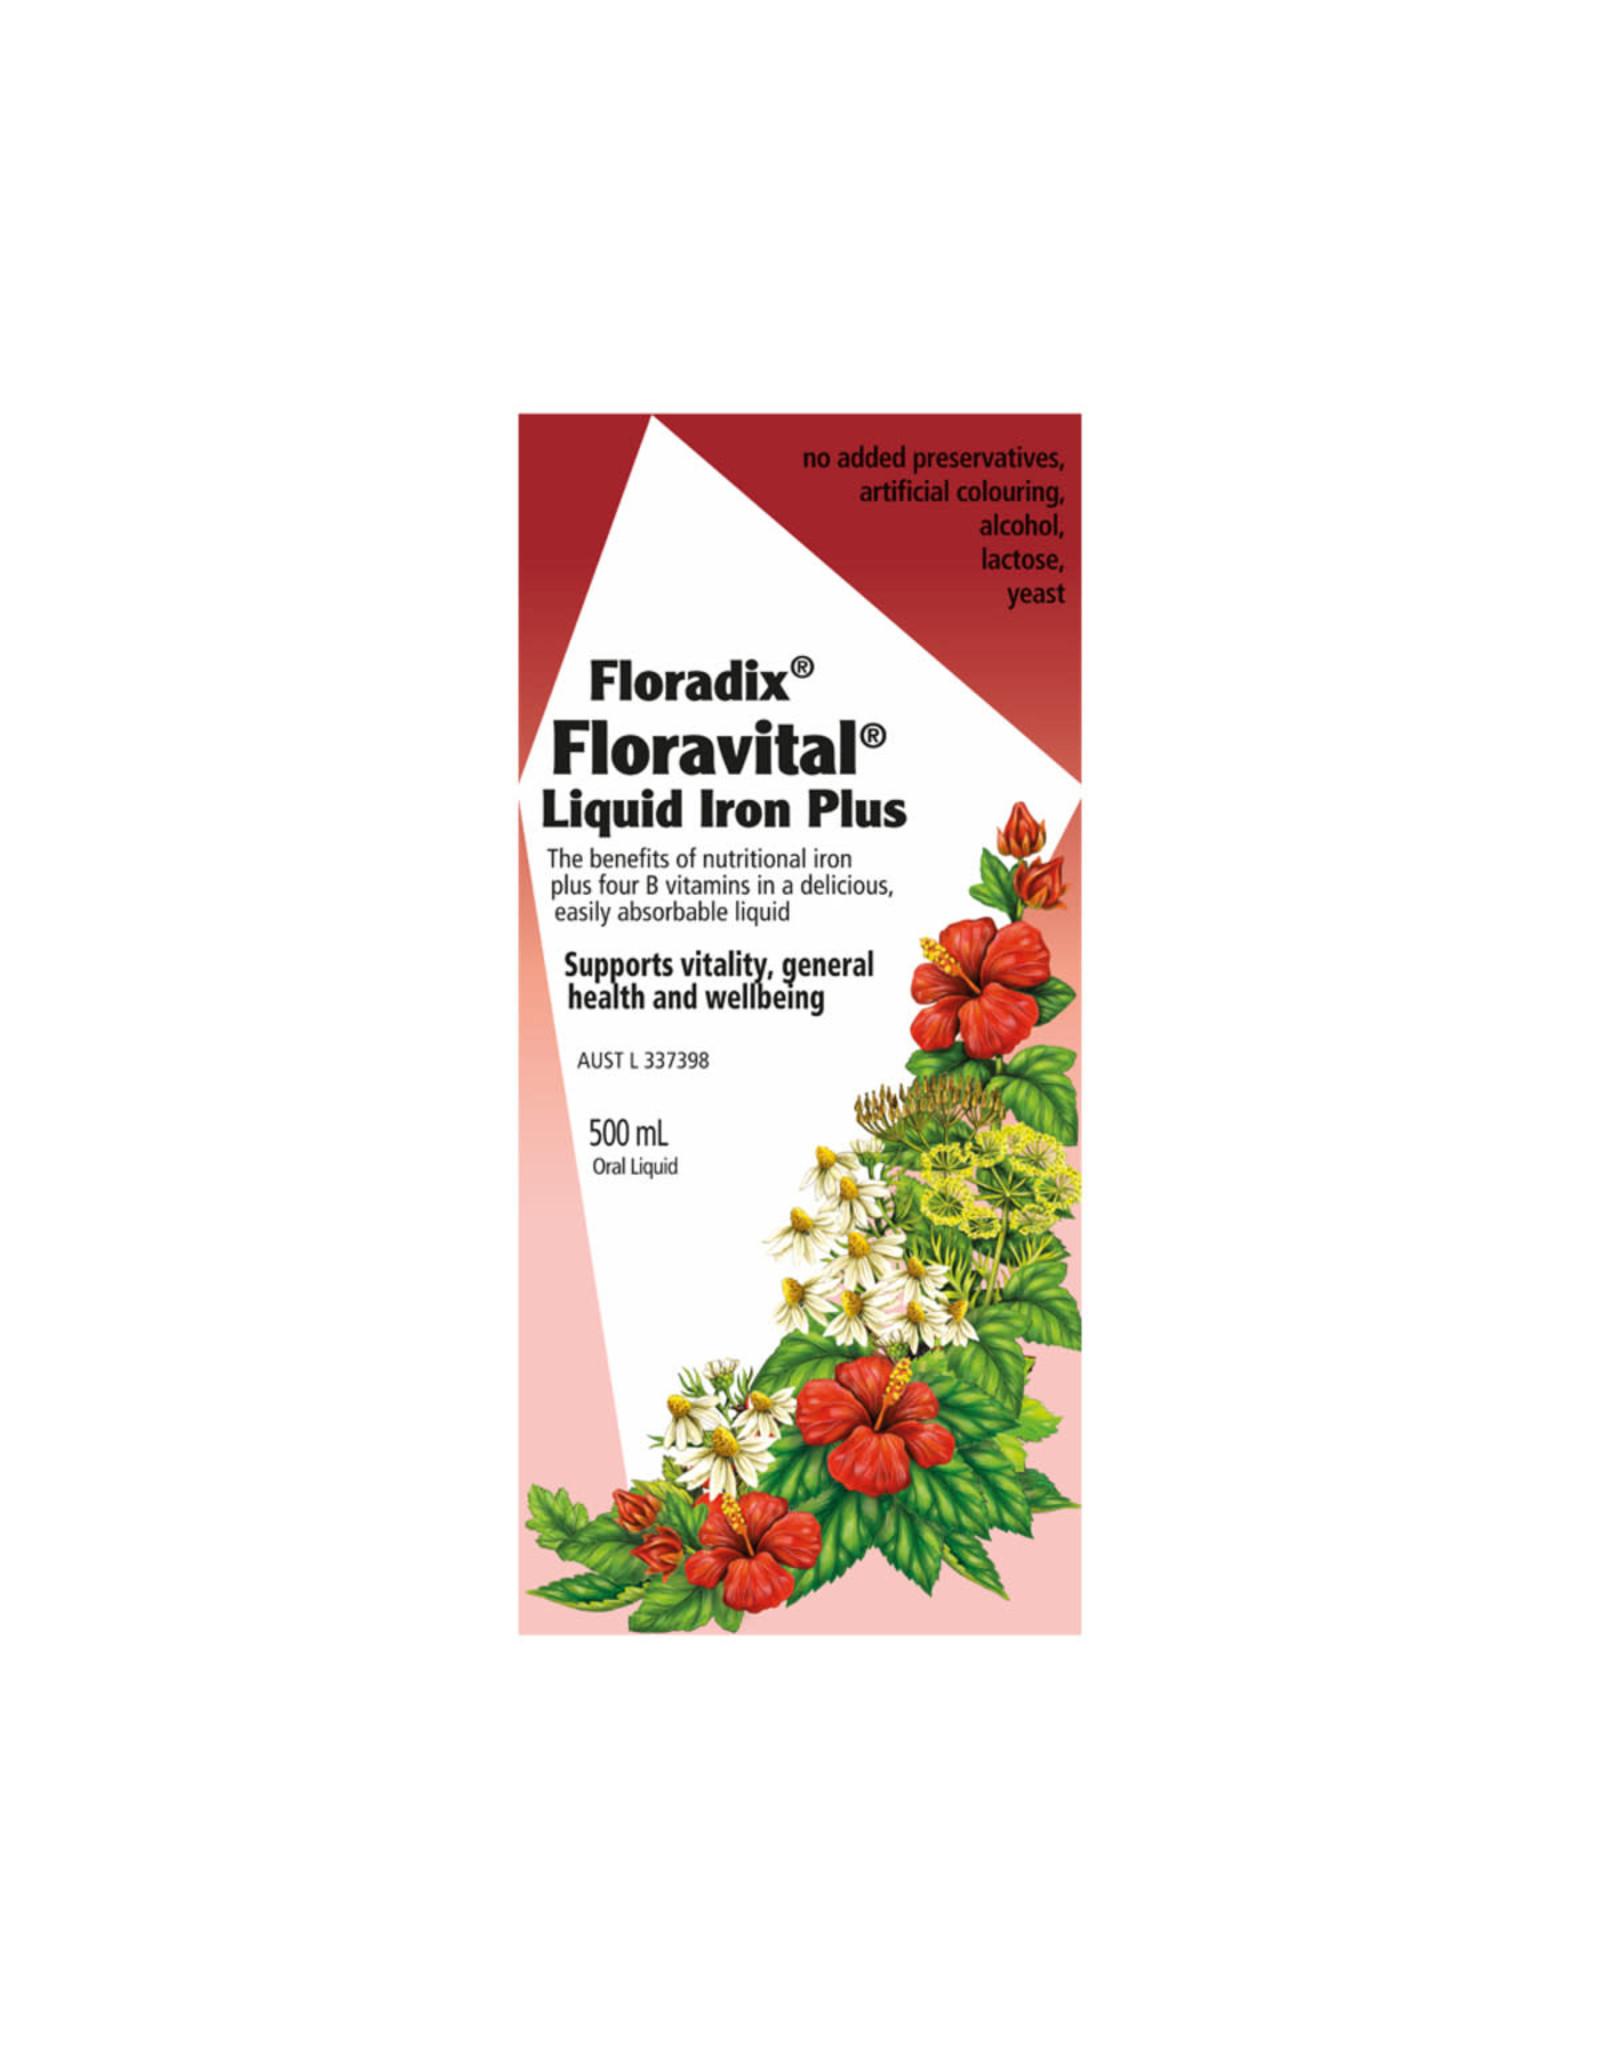 Floradix Floravital Liquid Iron Plus 500ml